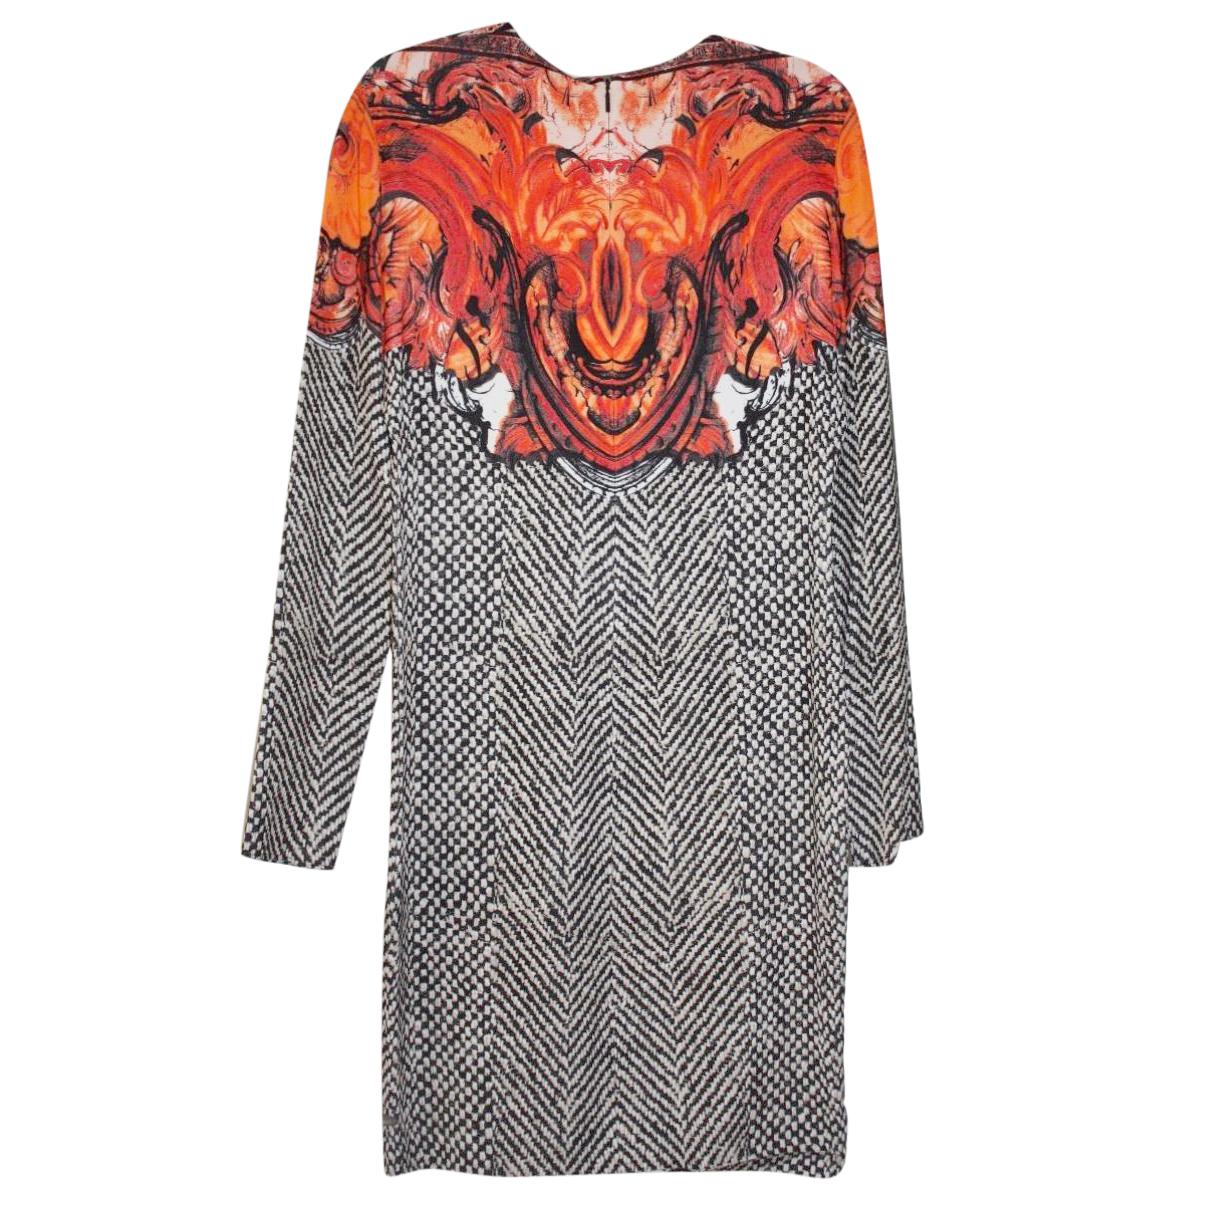 Roberto Cavalli Firebird Collection Dress